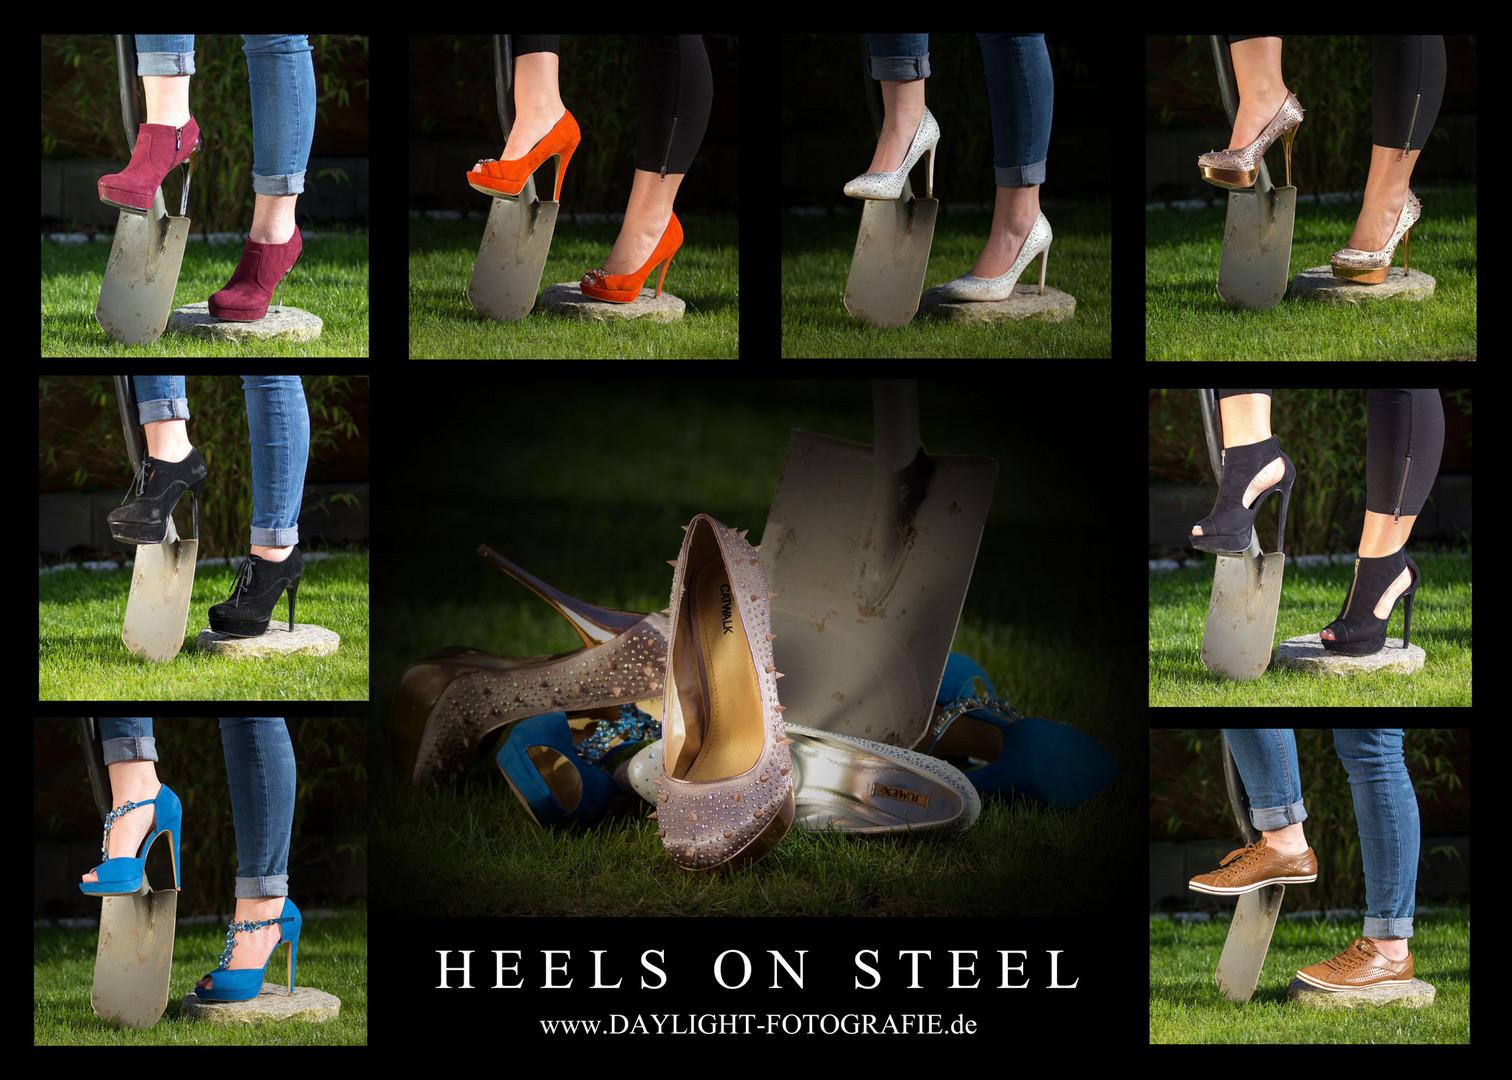 Heels on Steel